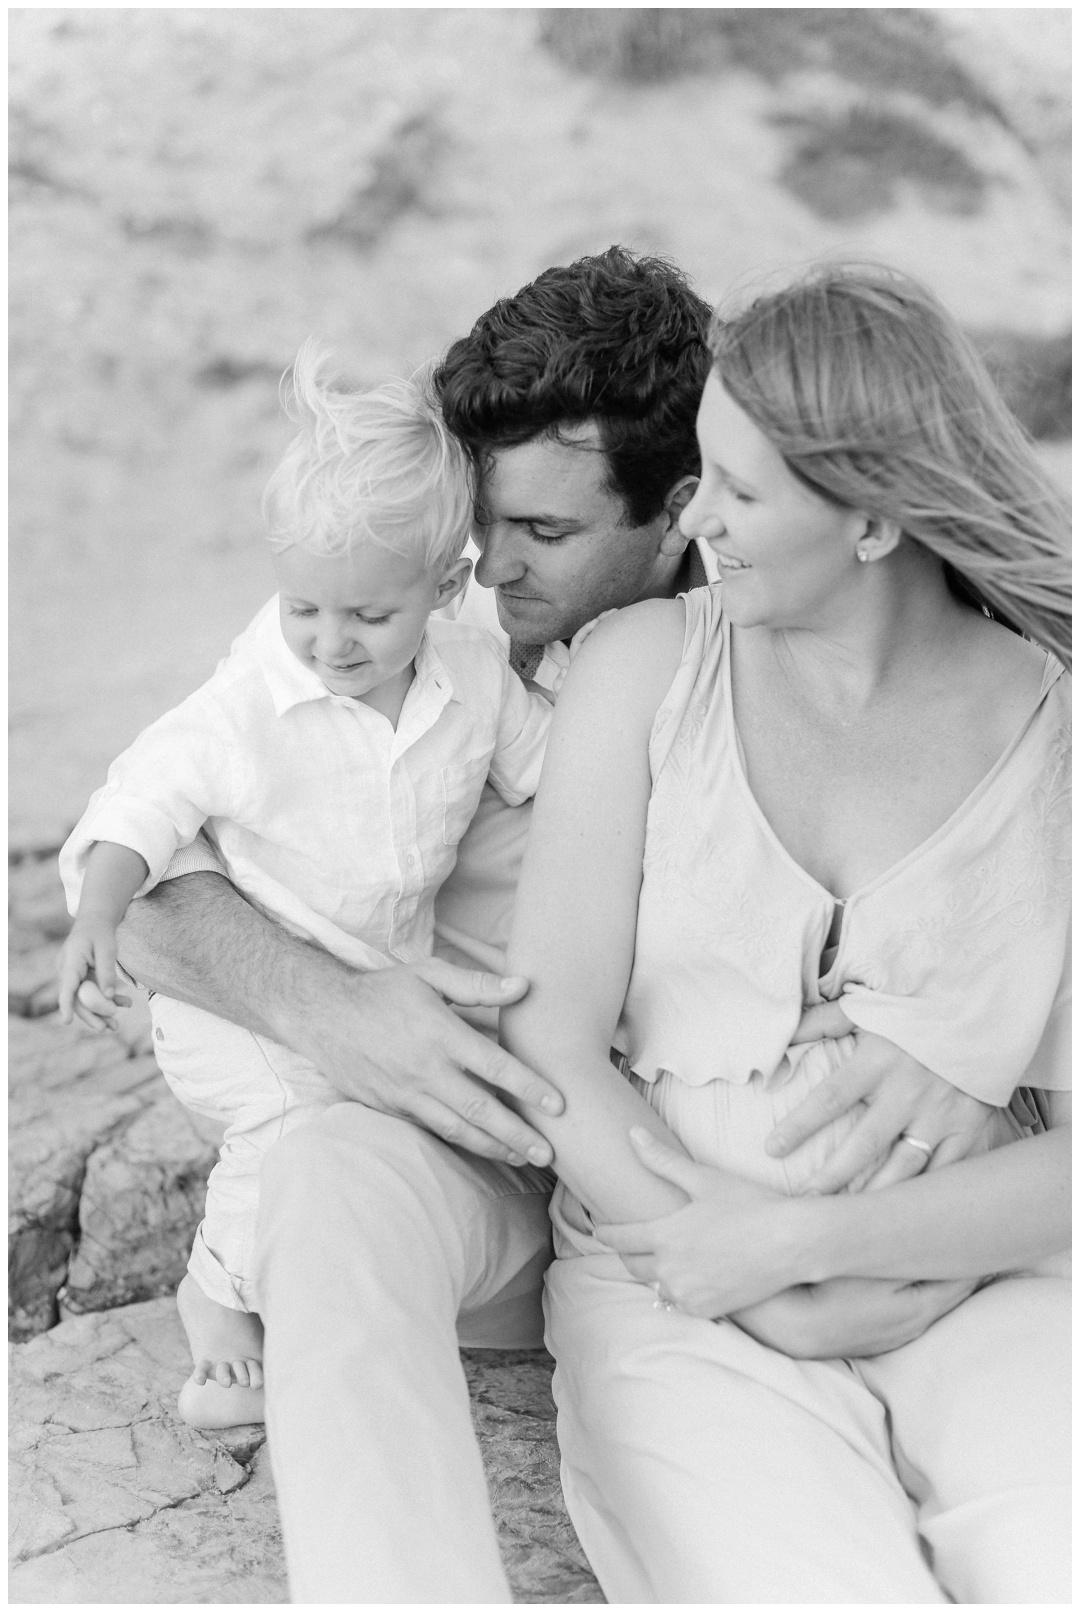 The_Epler's_Family_Newport_Beach_Family_Photographer_Orange_County_Family_Photography_Cori_Kleckner_Photography_Orange_County_Beach_Photographer_Family_Photos_Session_Crystal_Cove_Session__1419.jpg